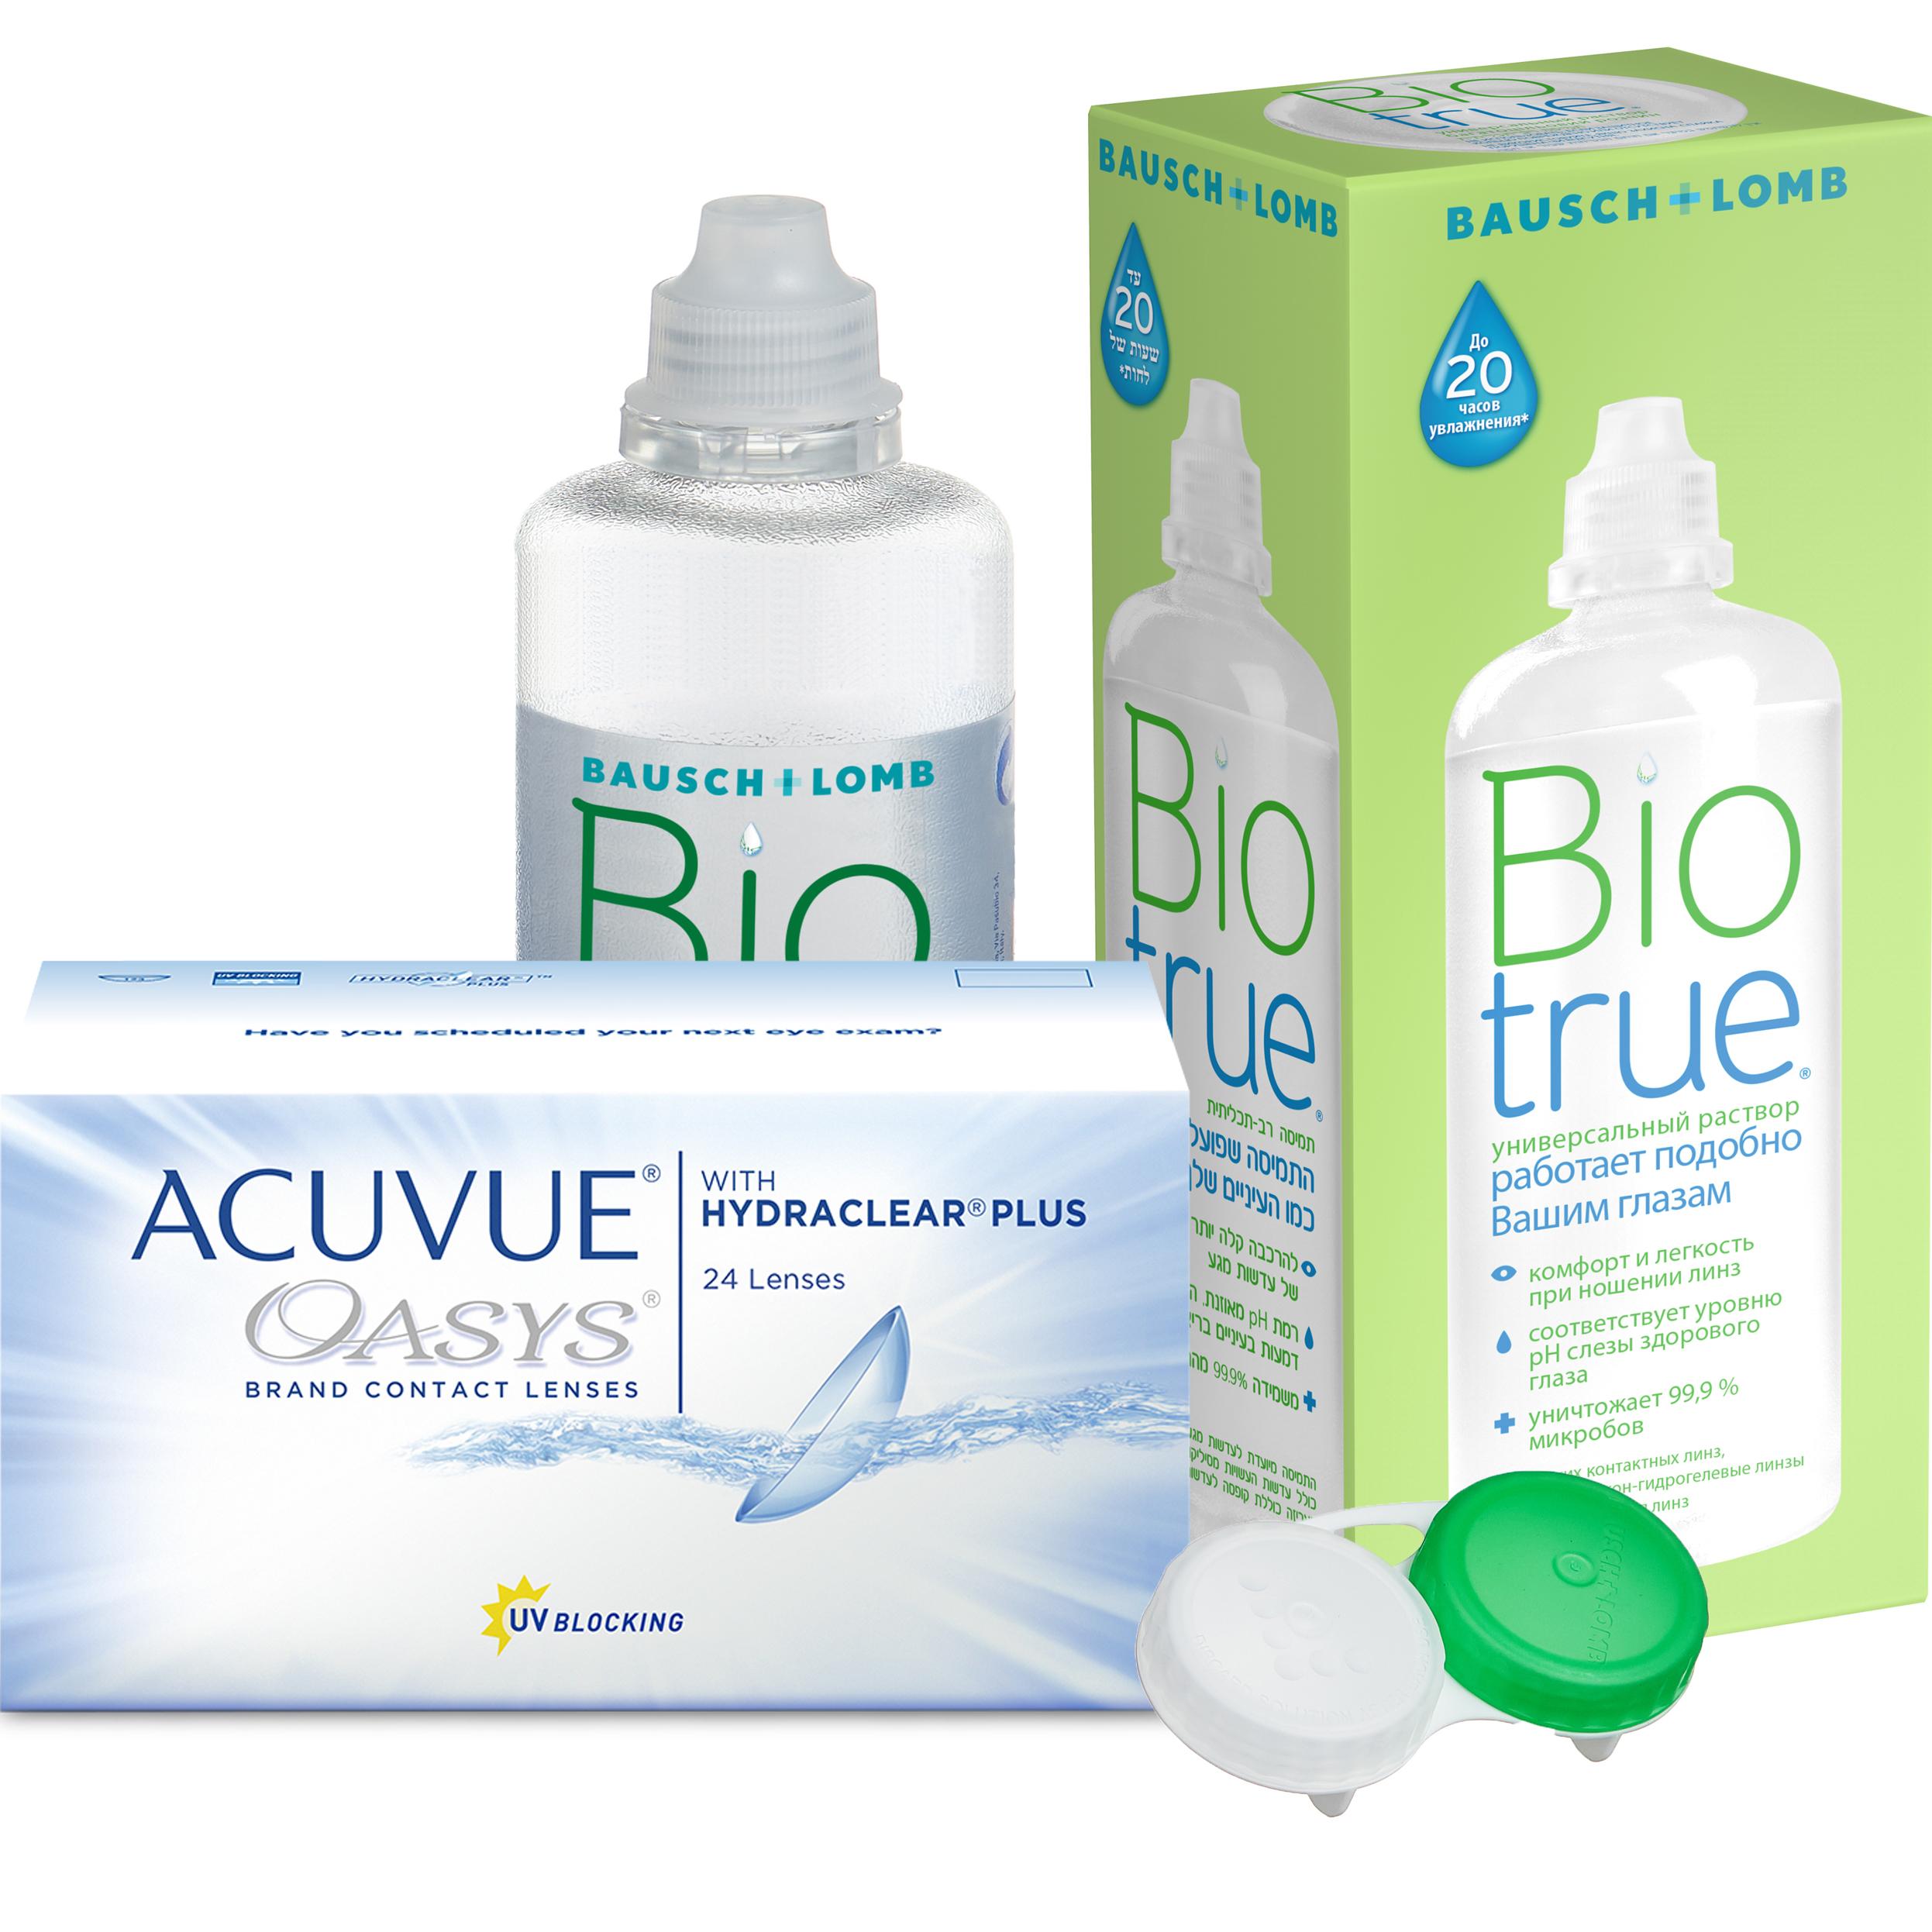 Купить Oasys with Hydraclear Plus 24 линзы + Biotrue, Контактные линзы Acuvue Oasys with Hydraclear Plus 24 линзы R 8.8 -12, 00 + Biotrue 300 мл